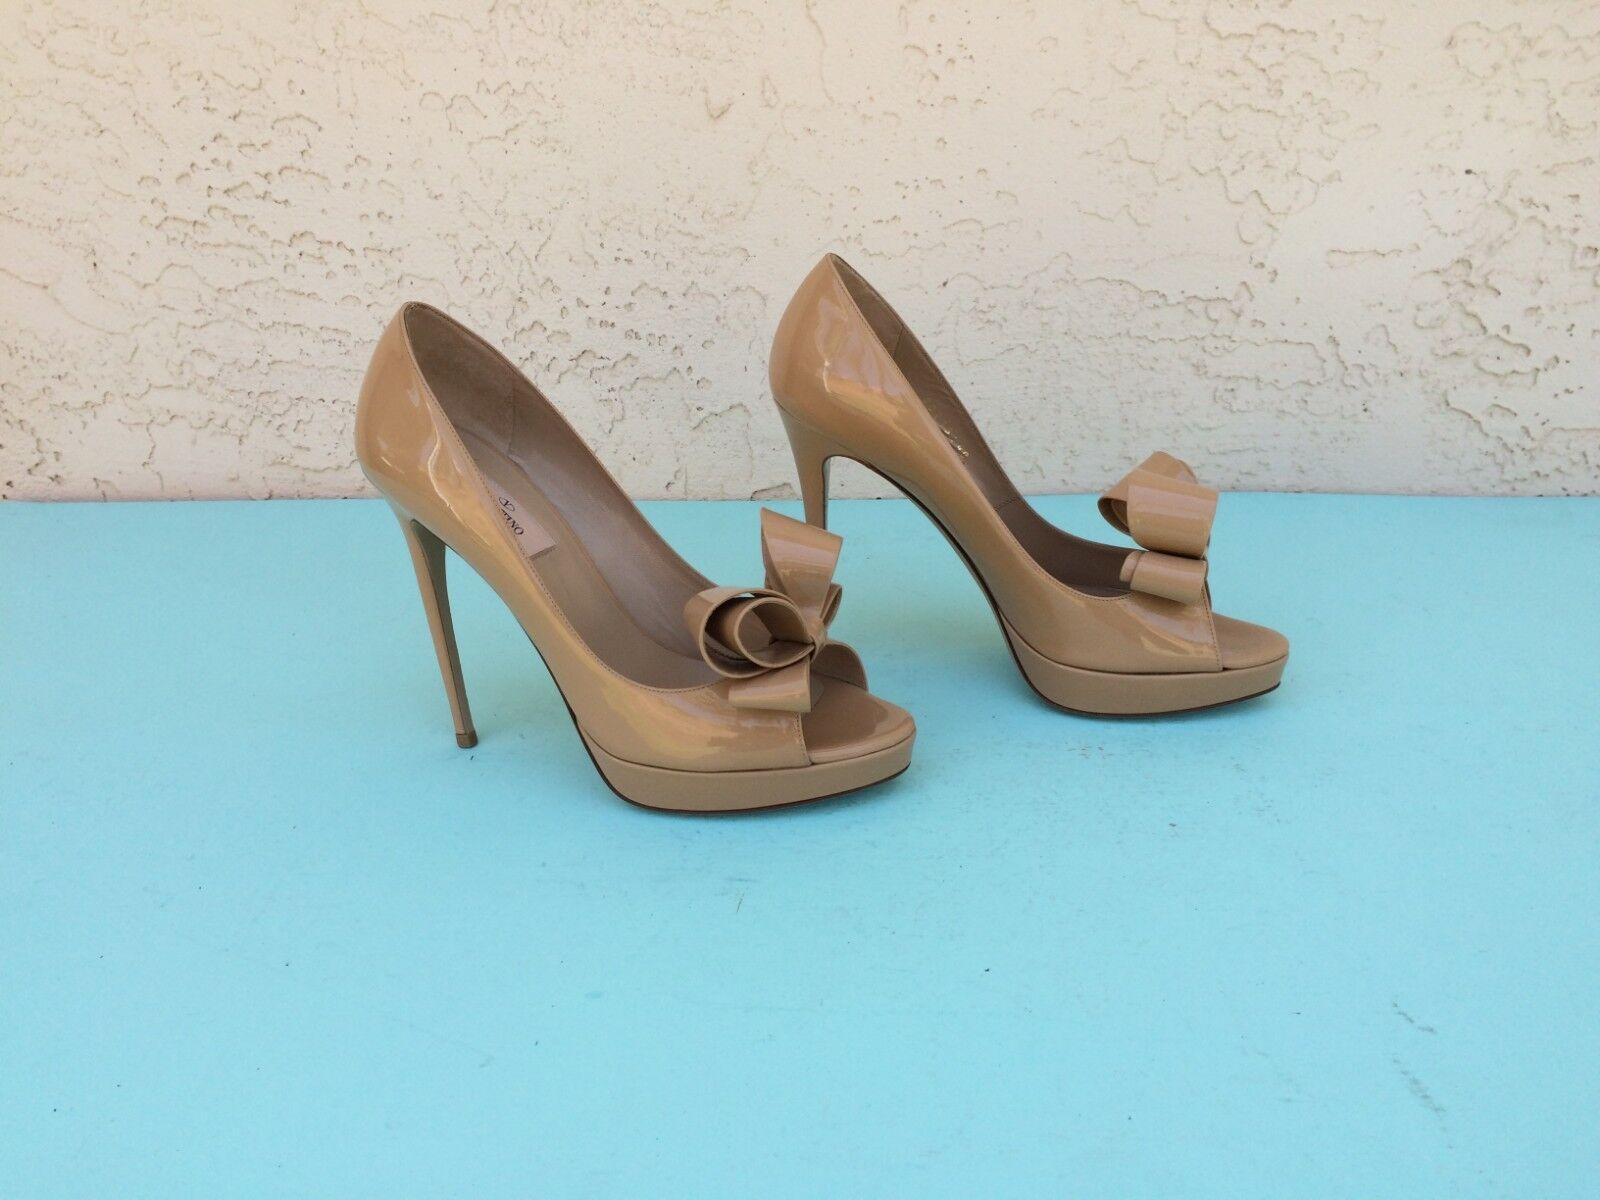 Valentino Garavani Couture Bow Platform Open Toe Pump Beige Patent Patent Patent Leather Sz 40 53ecf4